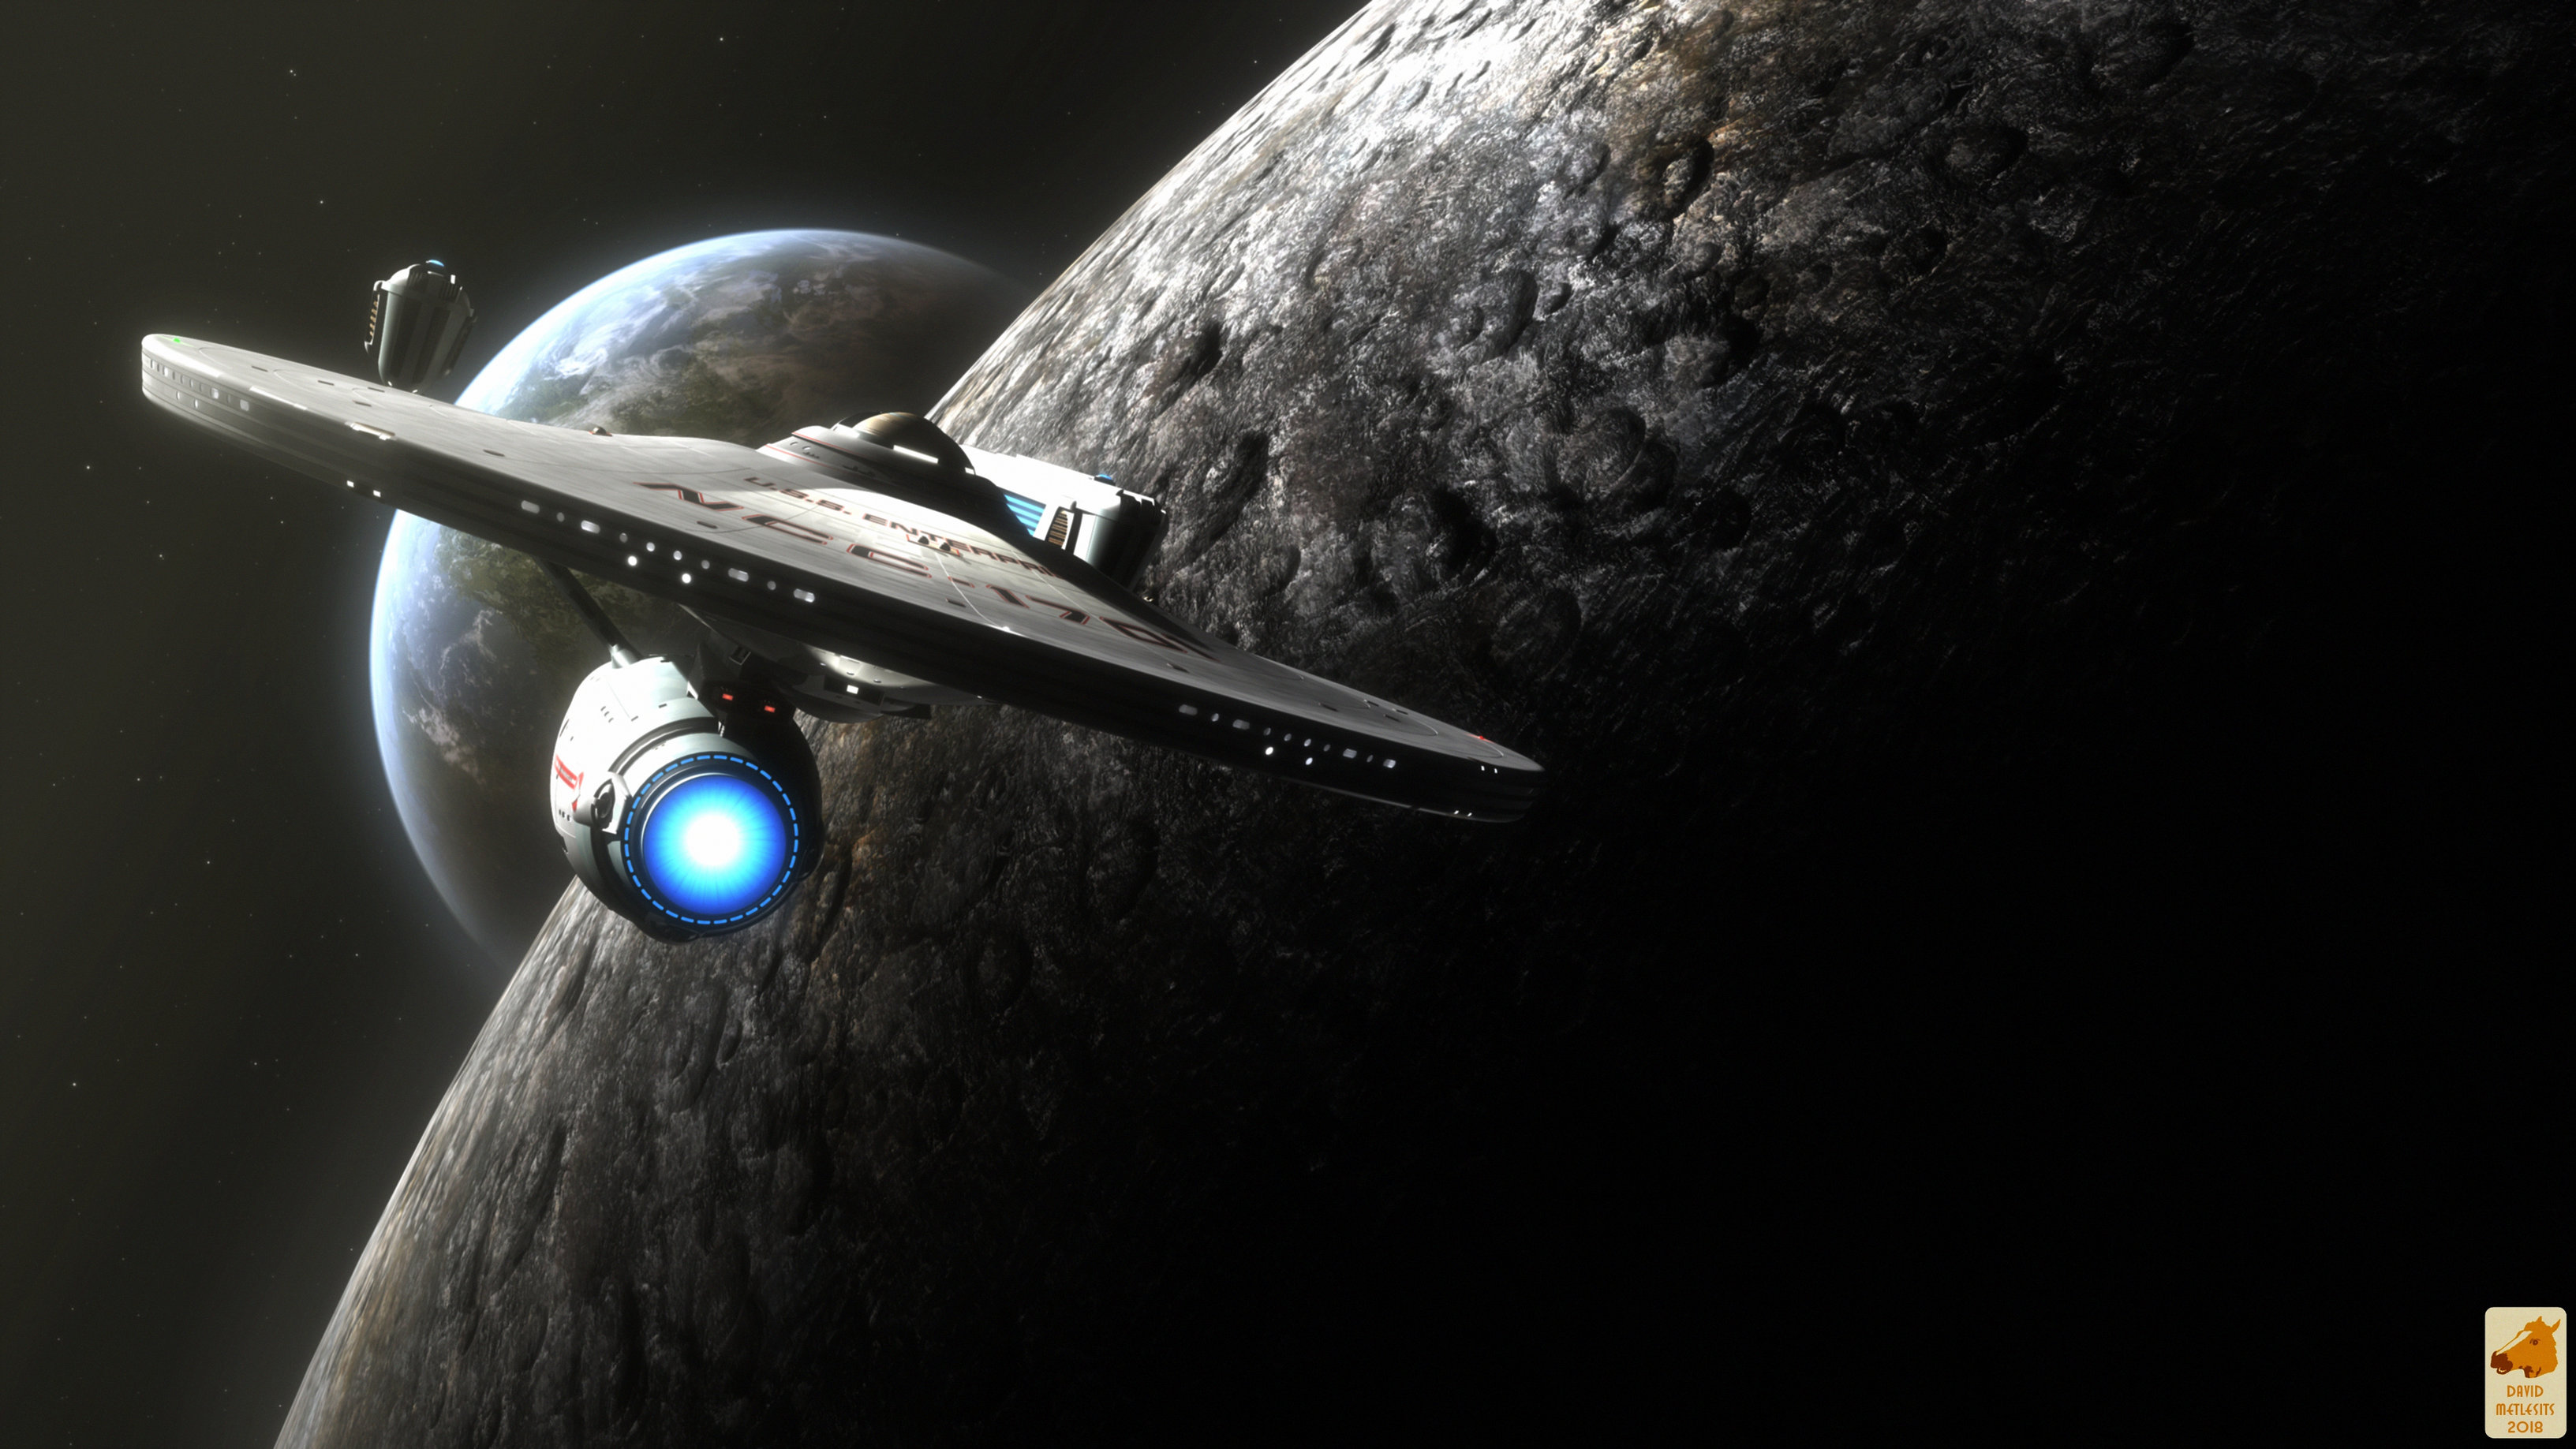 Unaccompanied minor by thefirstfleet